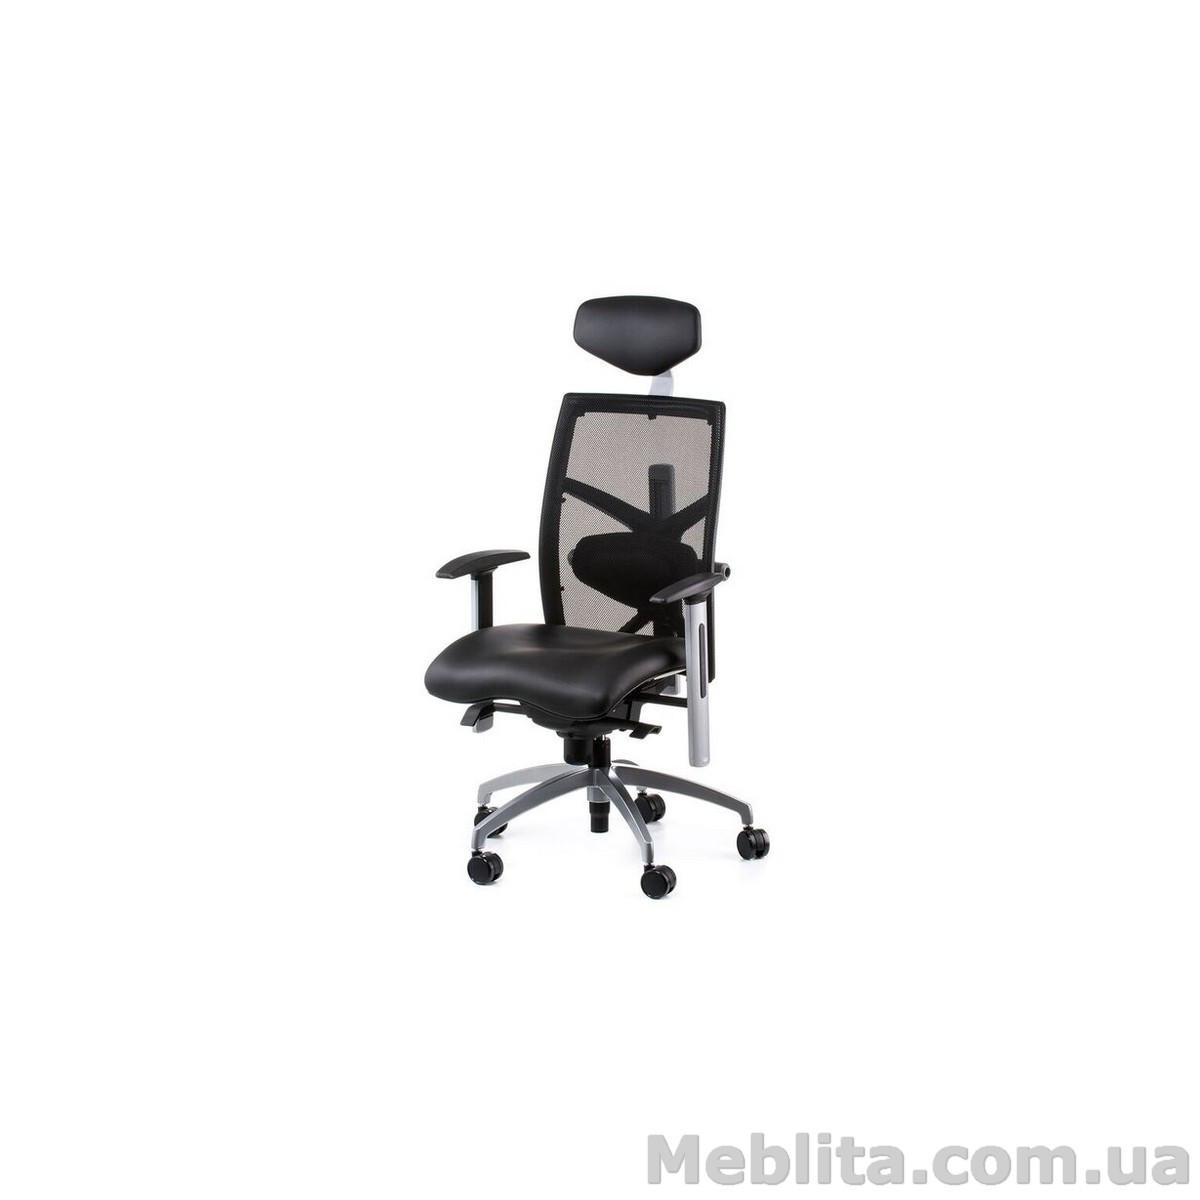 Кресло офисное еxact black lеathеr, black mеsh Special4You